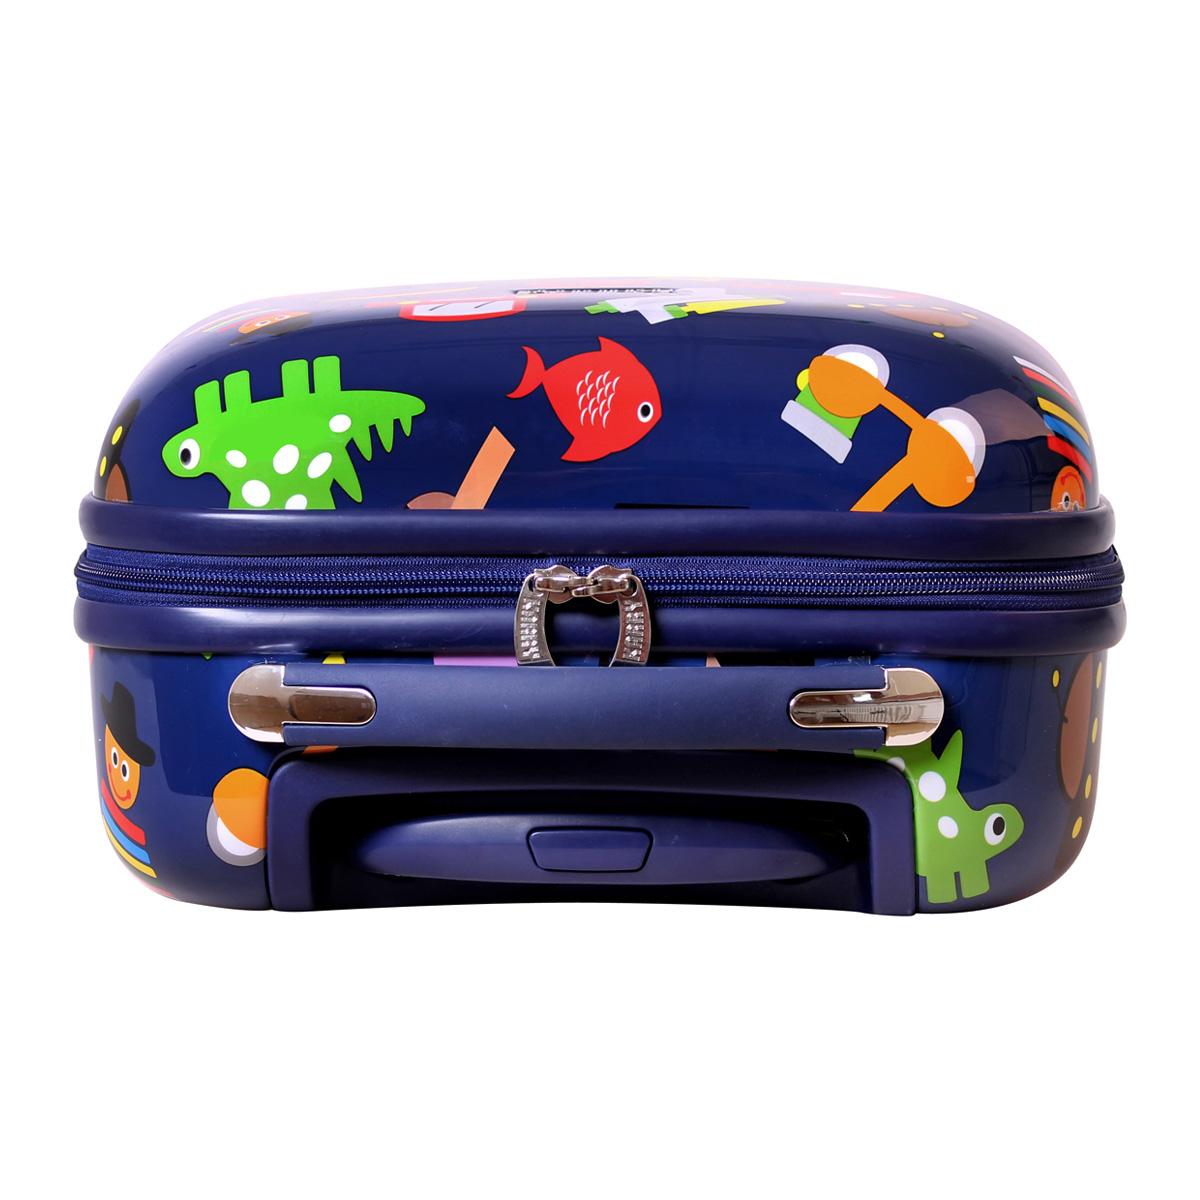 Hard Case Cabin Suitcase B M Gt Paris Hard Shell Suitcase